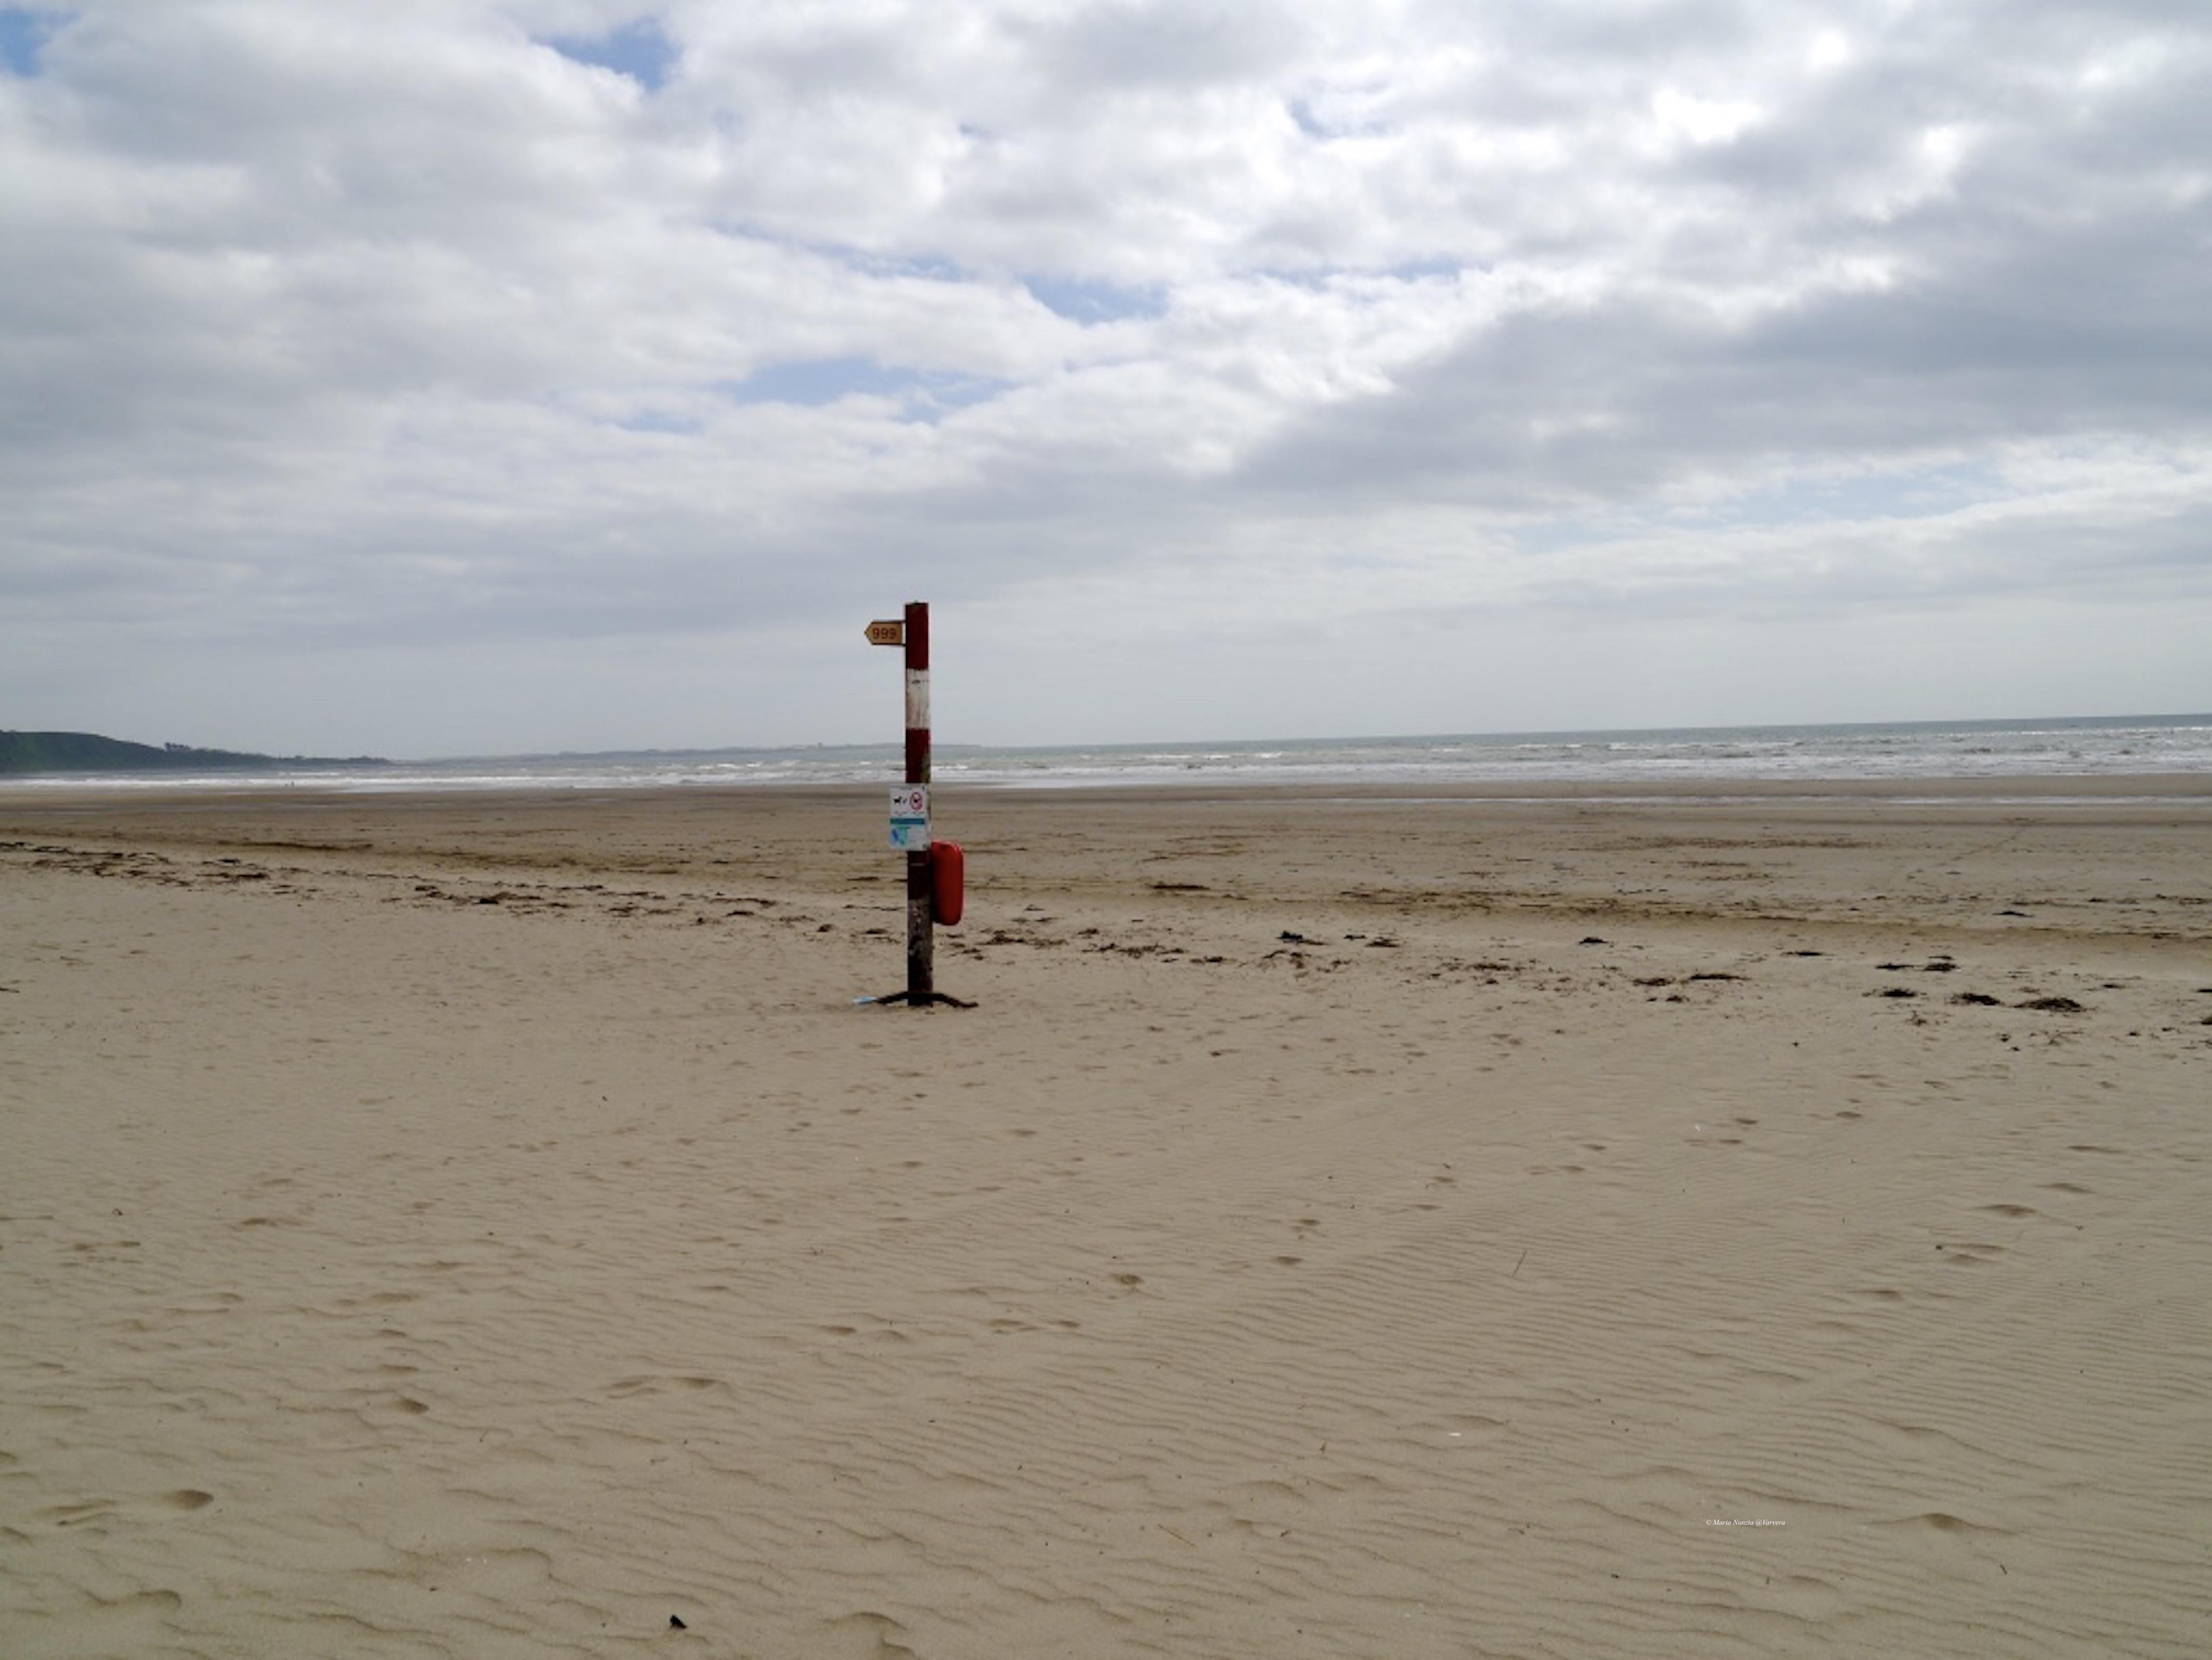 Morfa_Beach_©_Maria_Nunzia__Varvera_P1510960_1024_1024